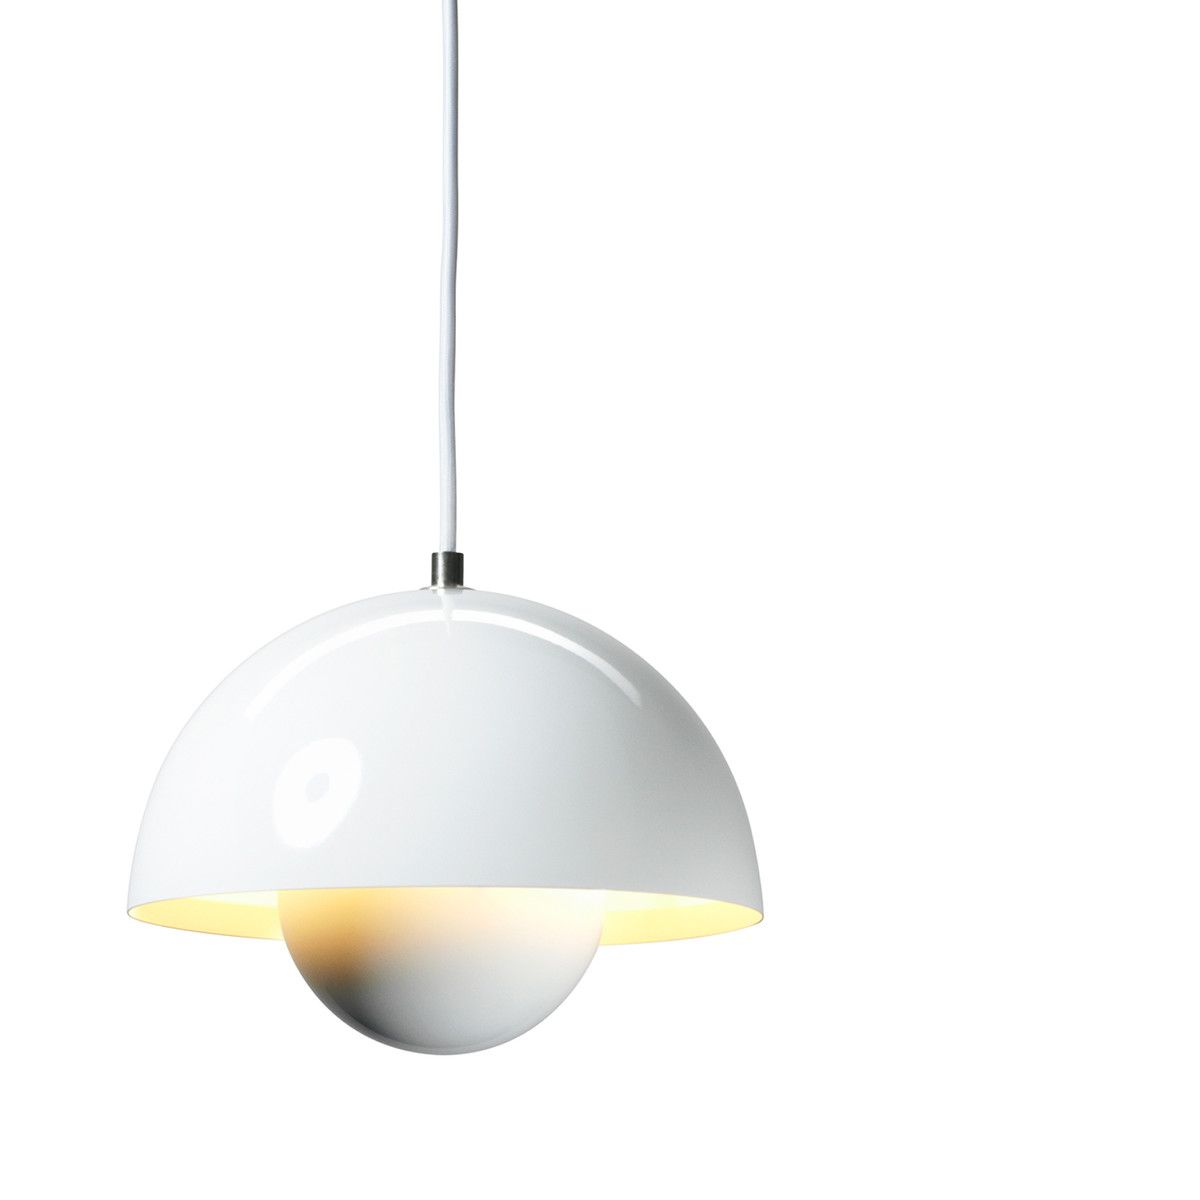 Flowerpot Pendant Lamp By Tradition Pendant Light Flowerpot Pendant Pendant Lamp